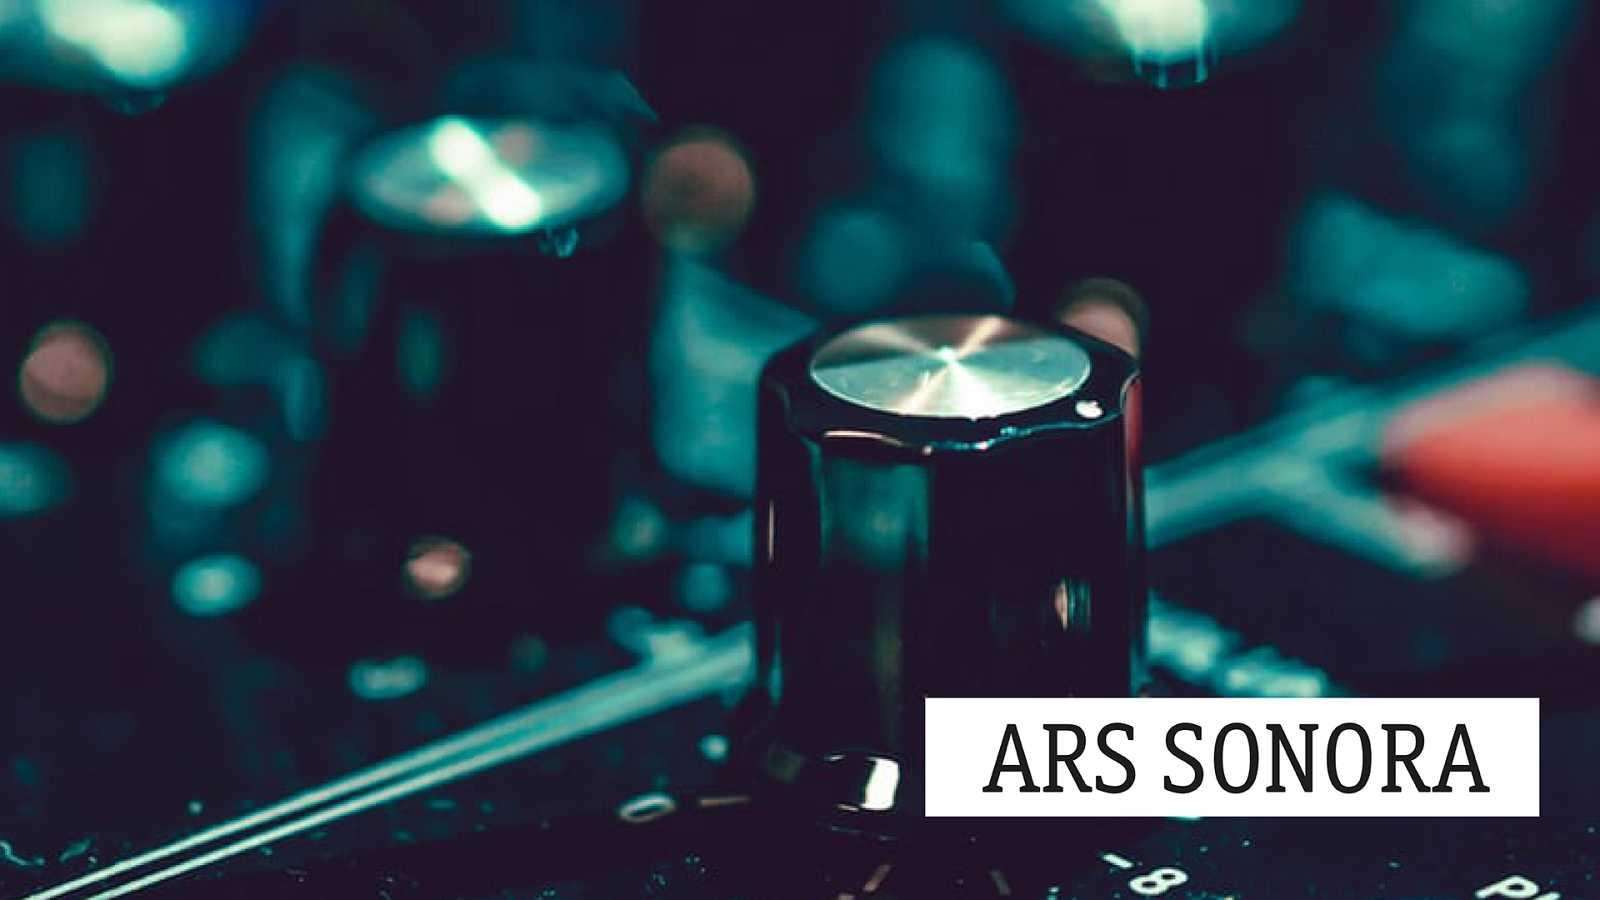 Ars sonora - Ellen Fullman (II) - 27/02/21 - escuchar ahora